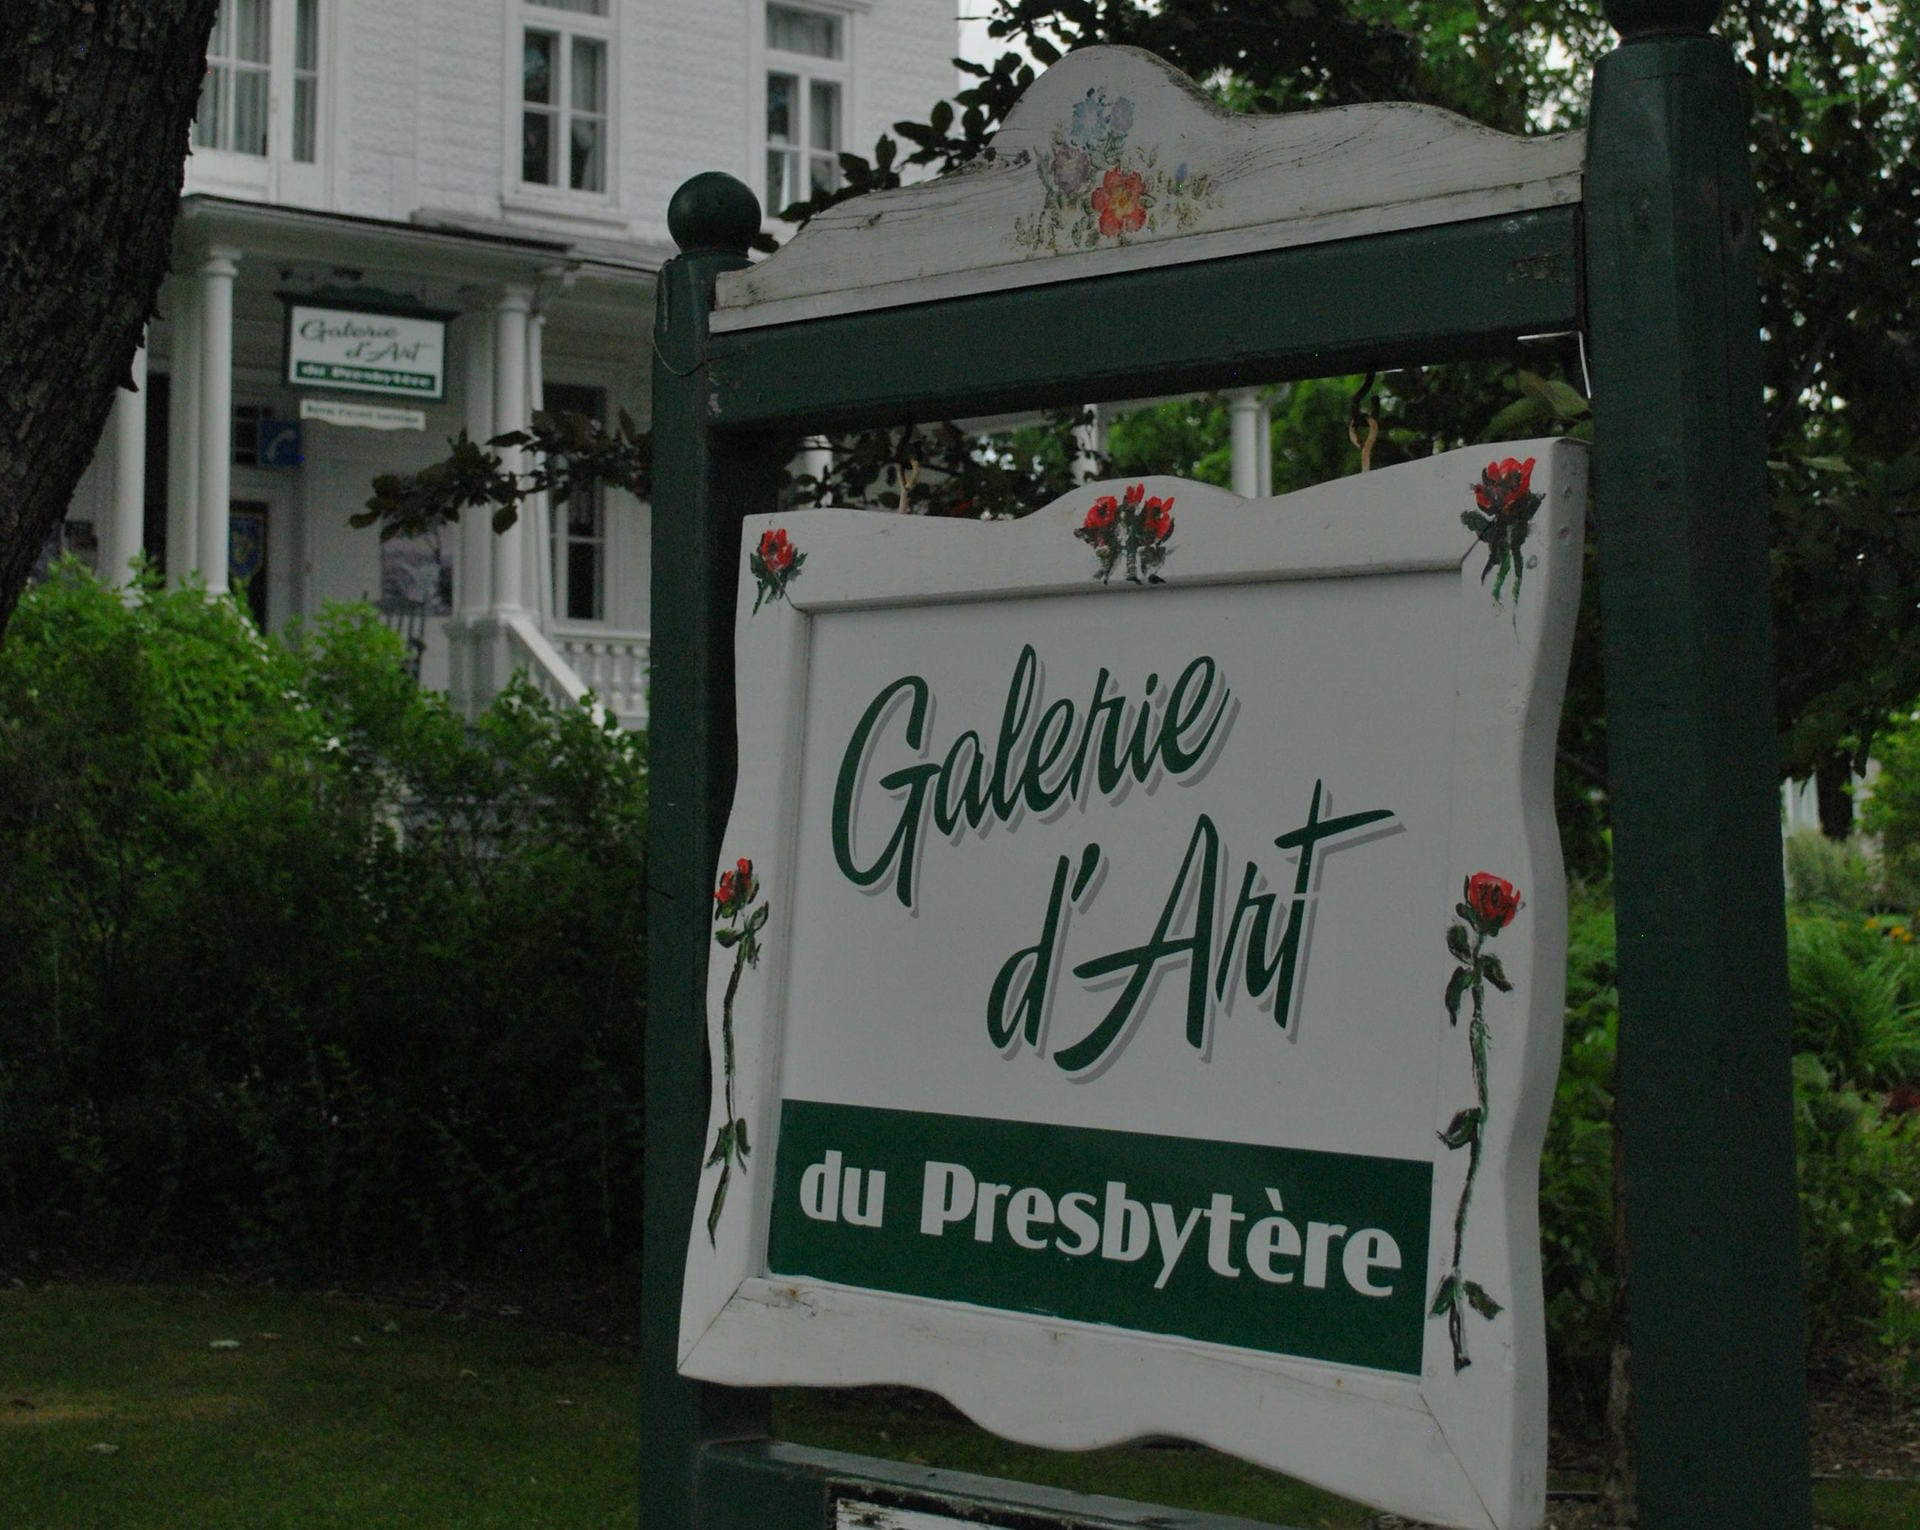 Galerie d'art du presbytère